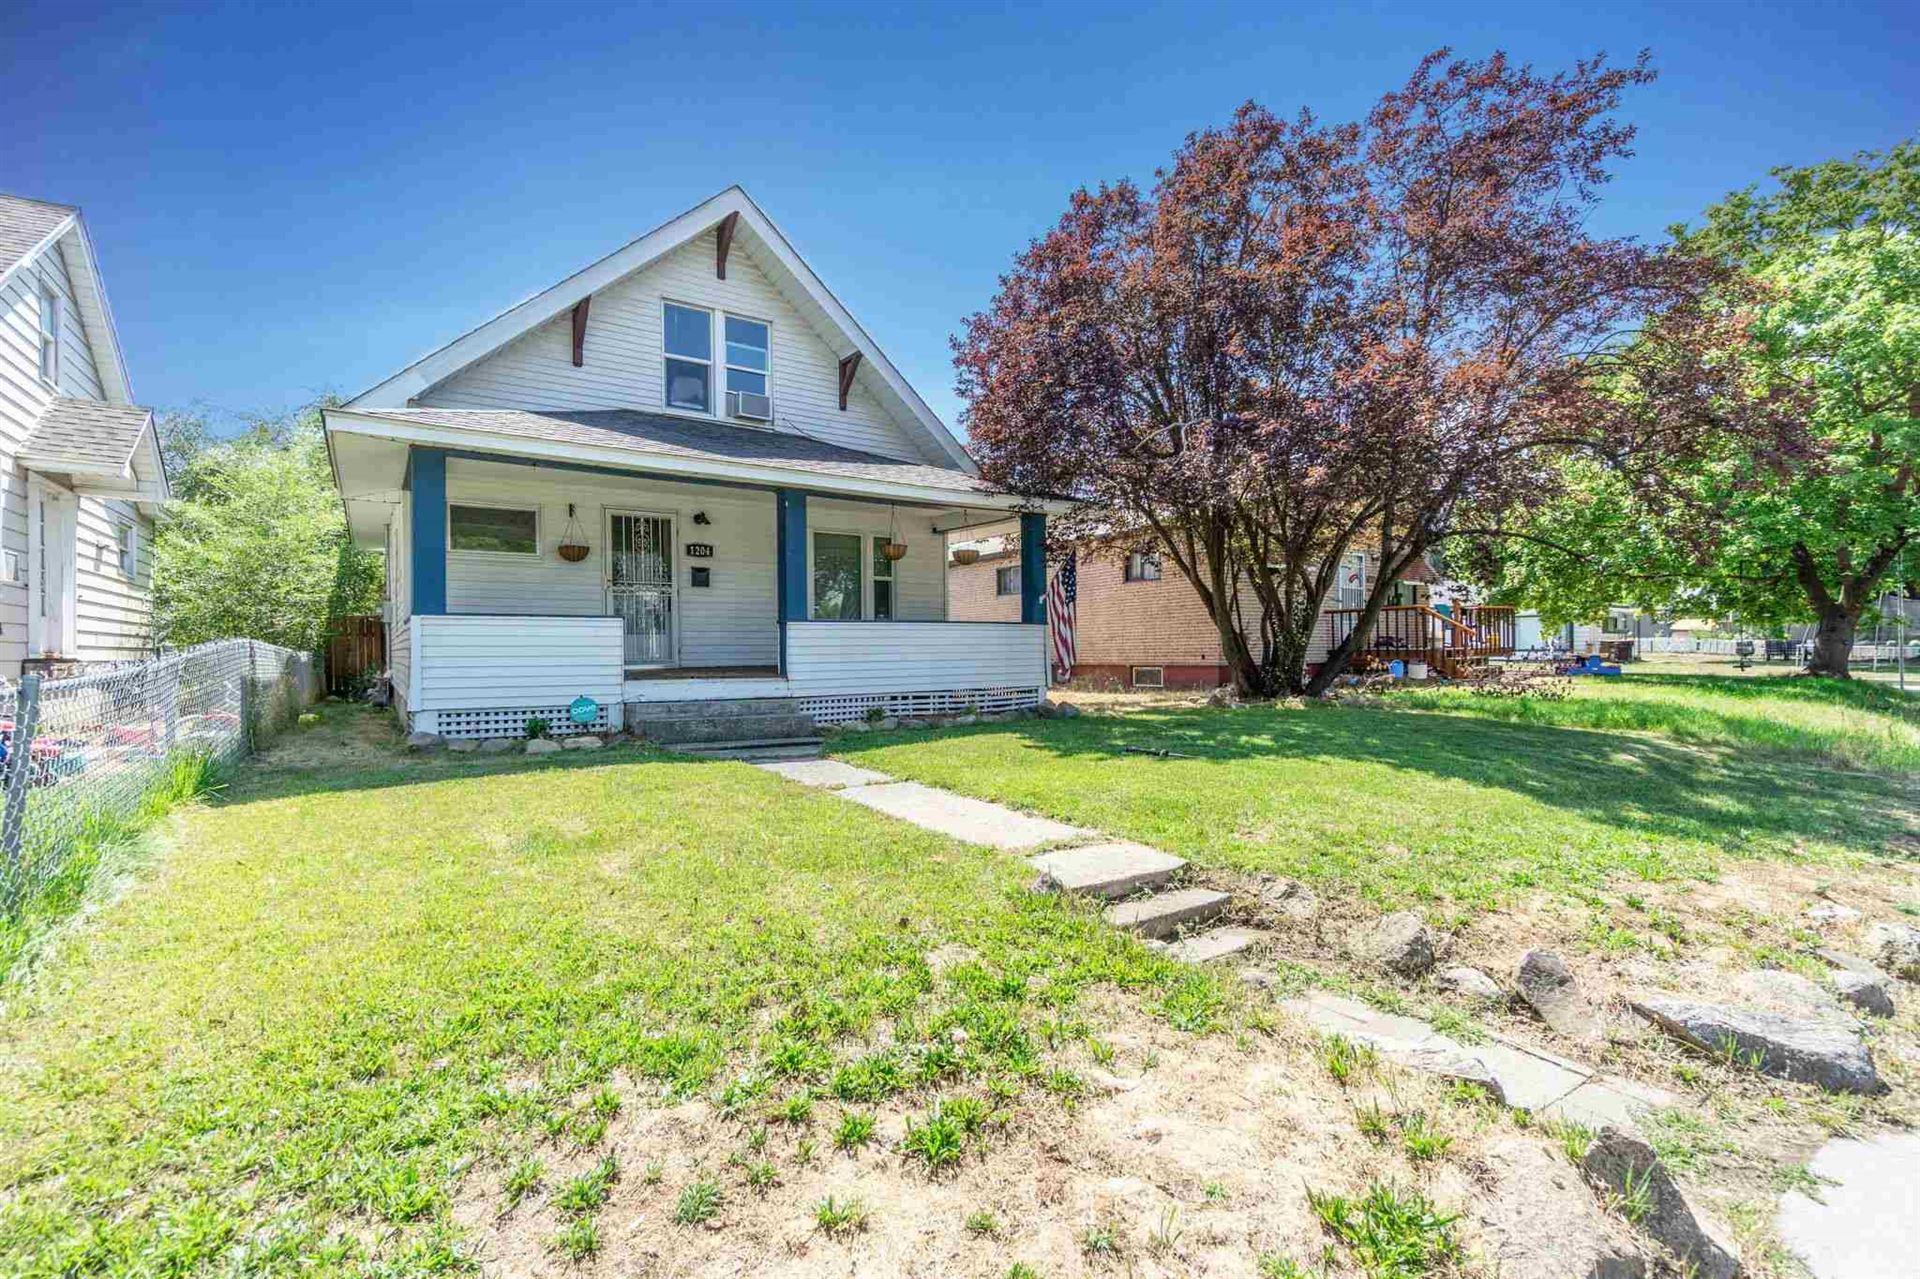 Photo of 1204 E North Ave, Spokane, WA 99207-3420 (MLS # 202119489)